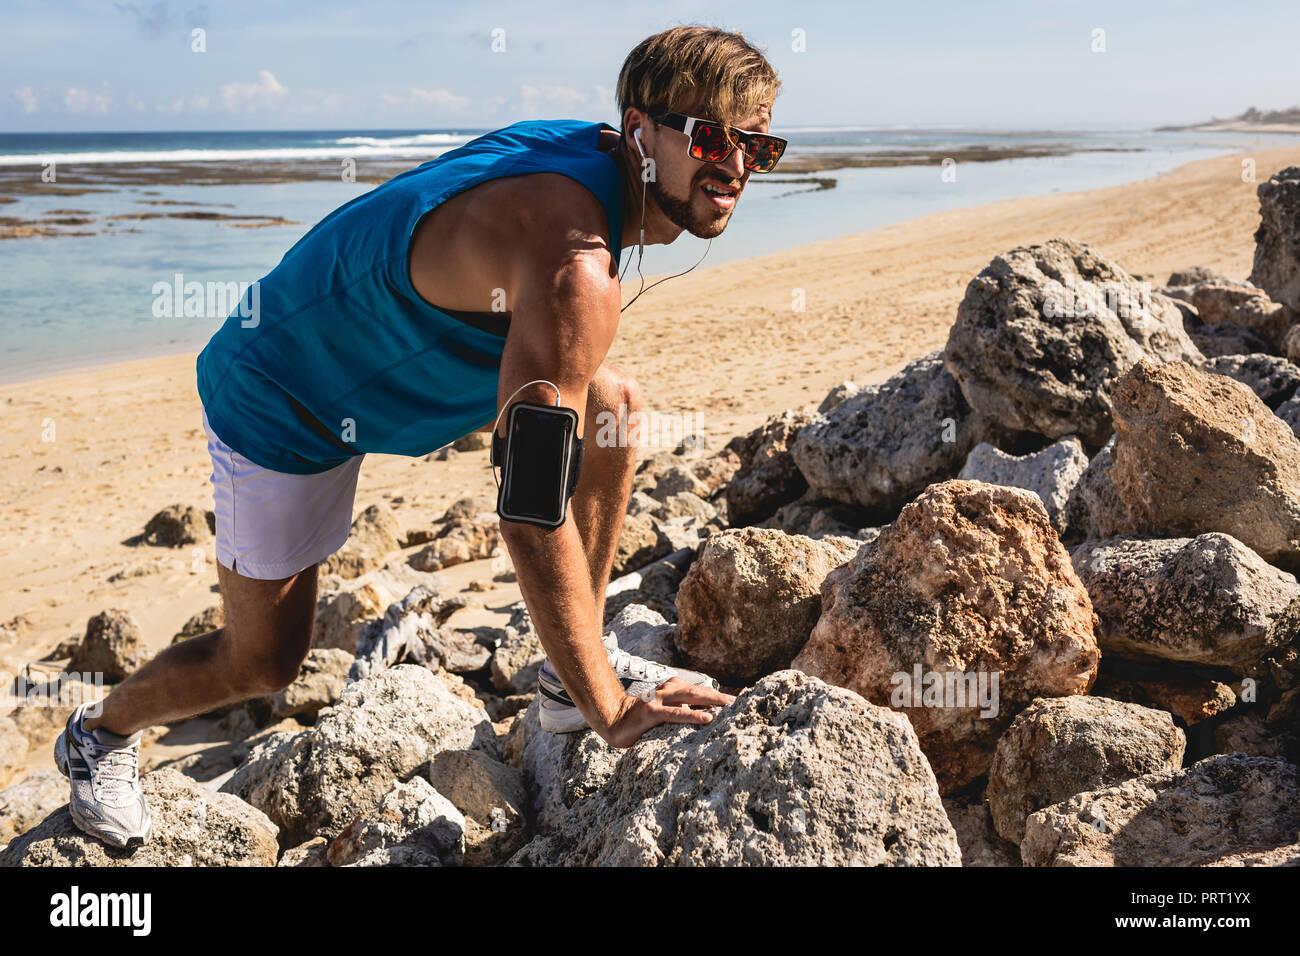 L'homme athlétique de brassard climbing on rocks on beach, Bali, Indonésie Photo Stock